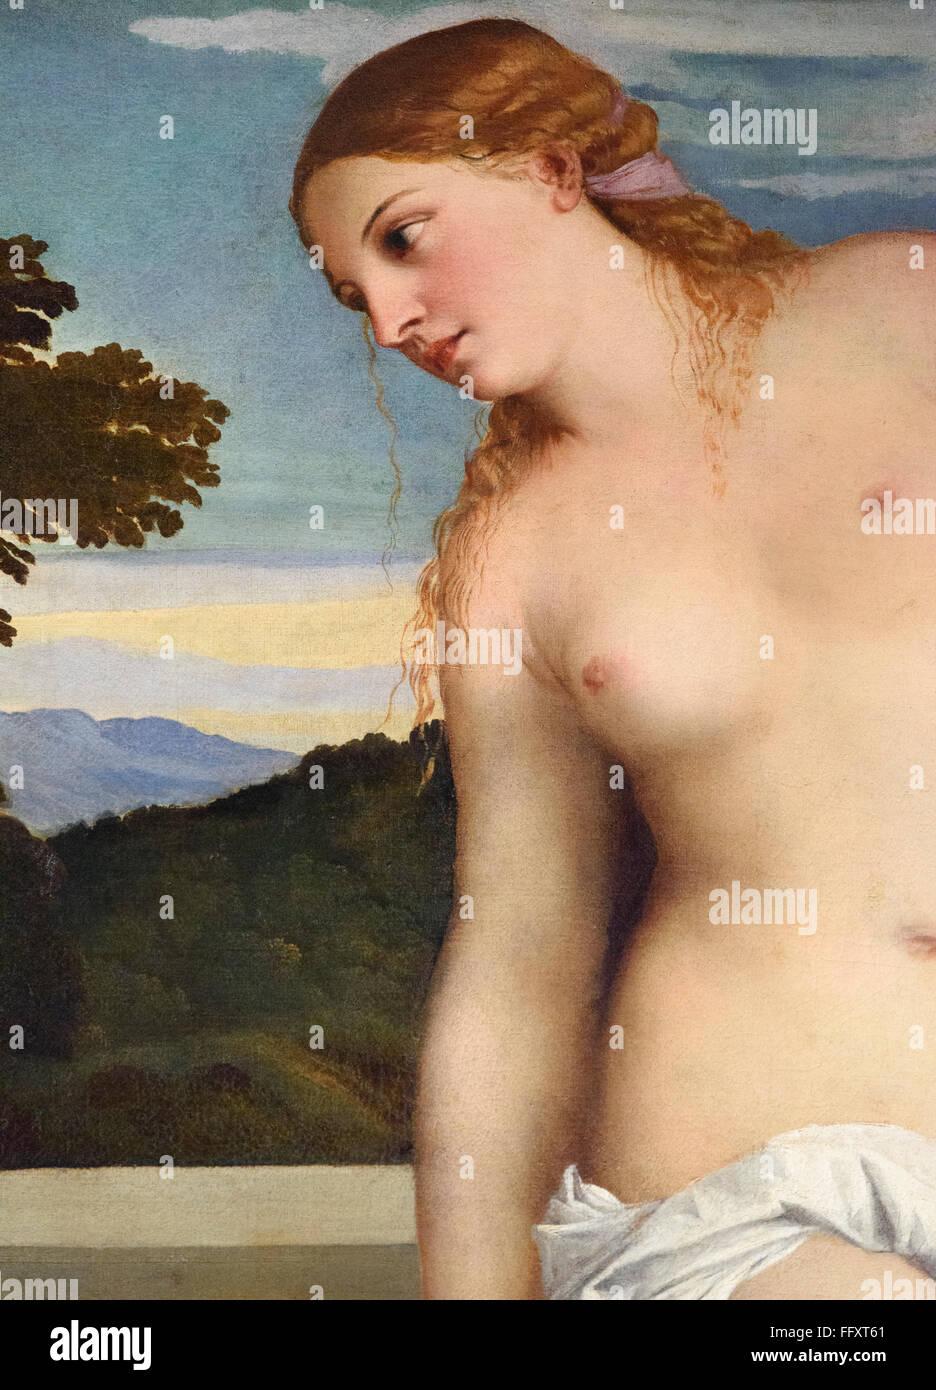 Roma. Italia. Amor sagrado y profano, detalle de Afrodita, (c. 1514), por Tiziano (c. 1488/1490 - 1576), la Galleria Imagen De Stock